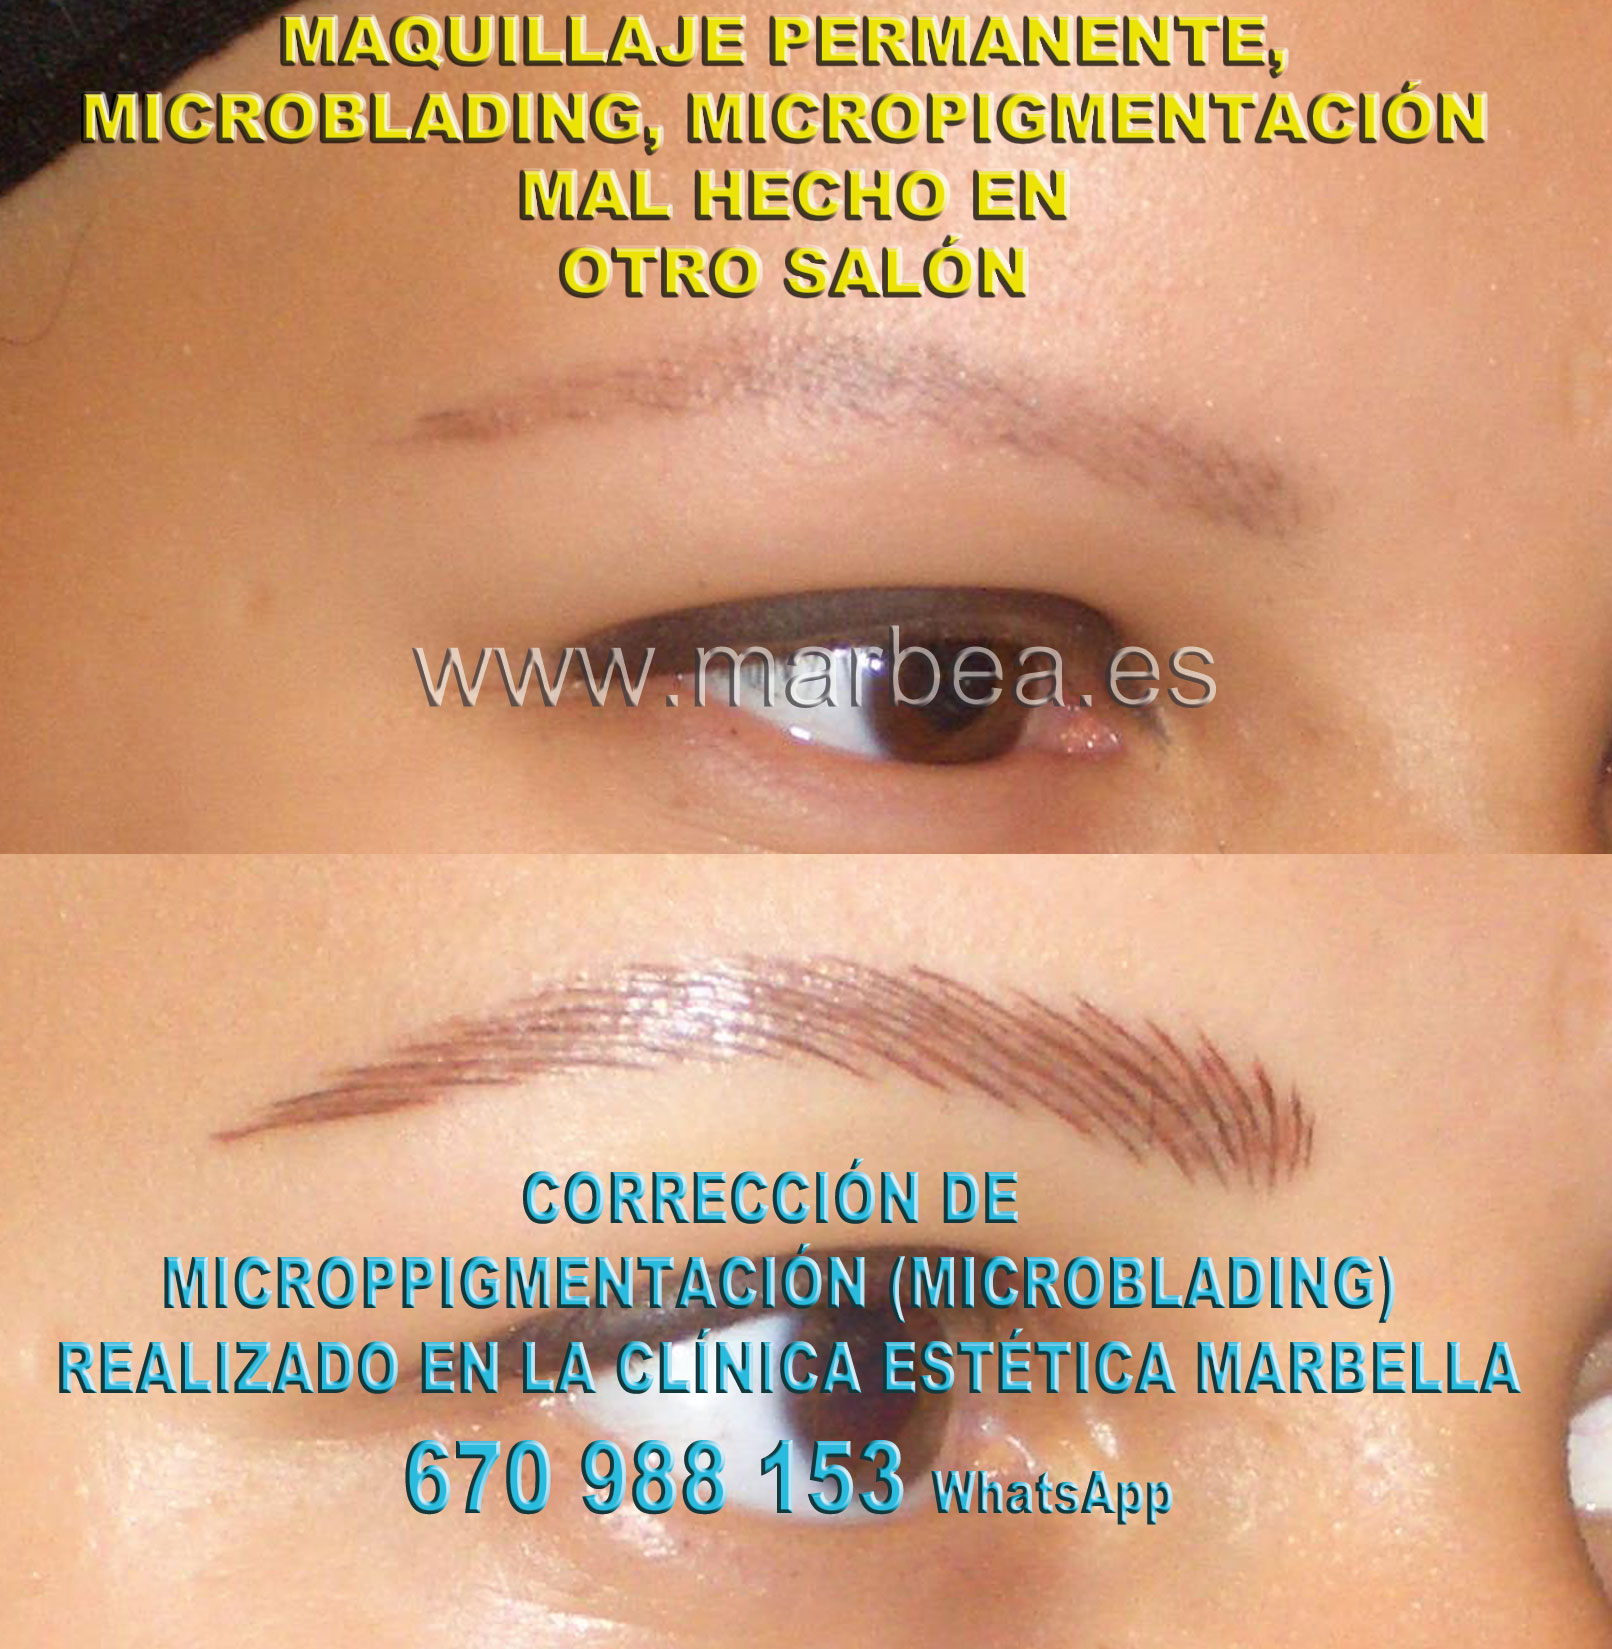 ELIMINAR TATUAJE CEJAS clínica estética maquillaje semipermanente entrega como aclarar la micropigmentación cejas,corregir micropigmentación mal hecha